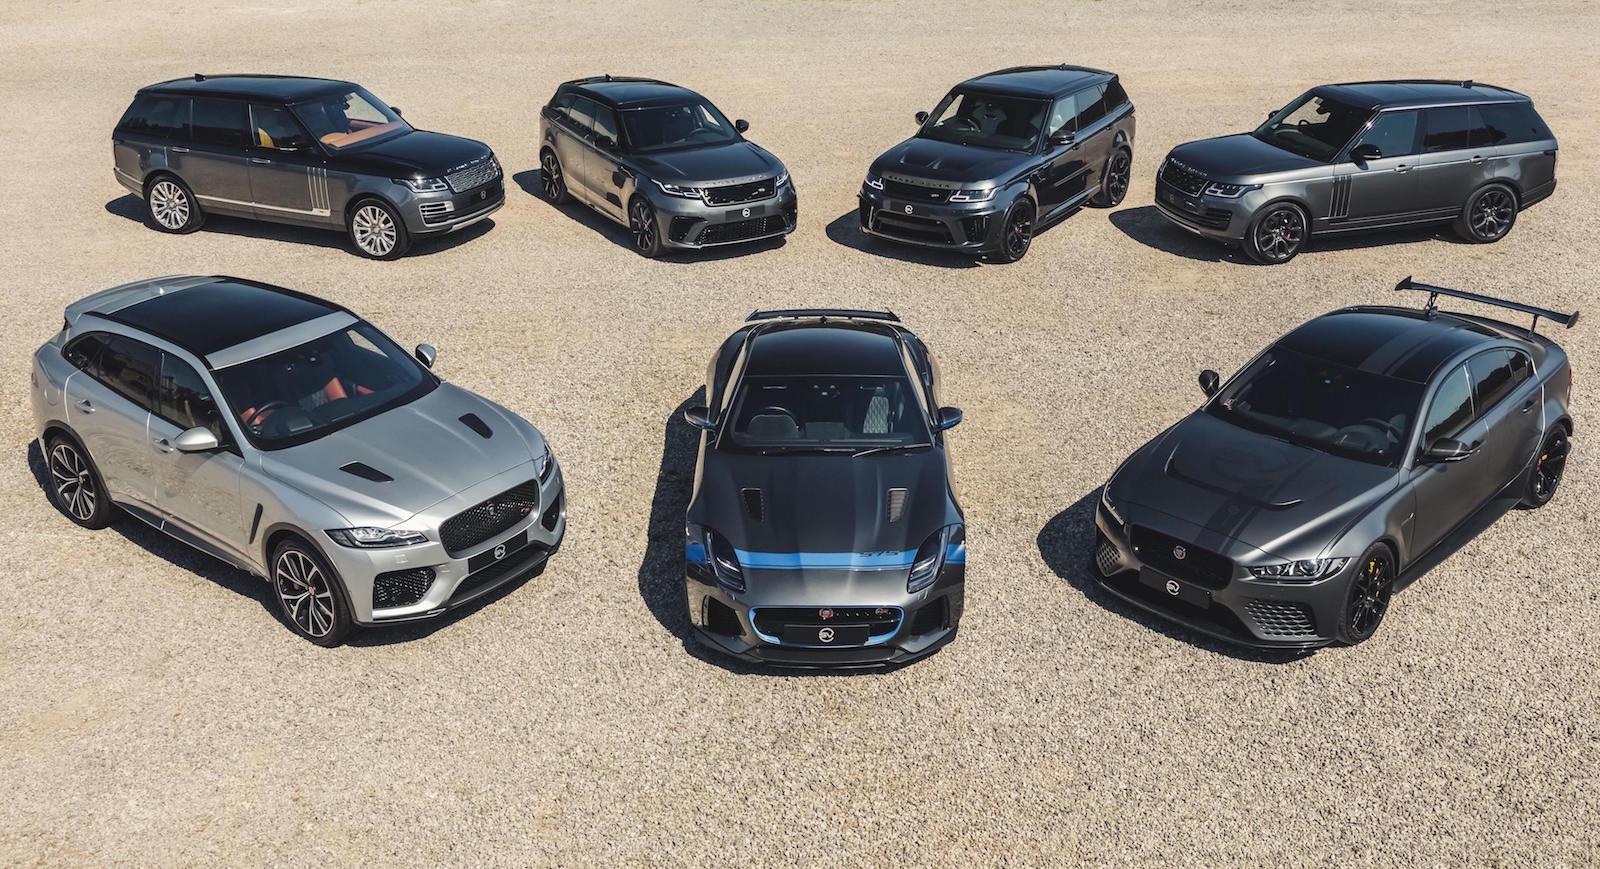 Jaguar Land Rover global sales down 23.6% in 2020